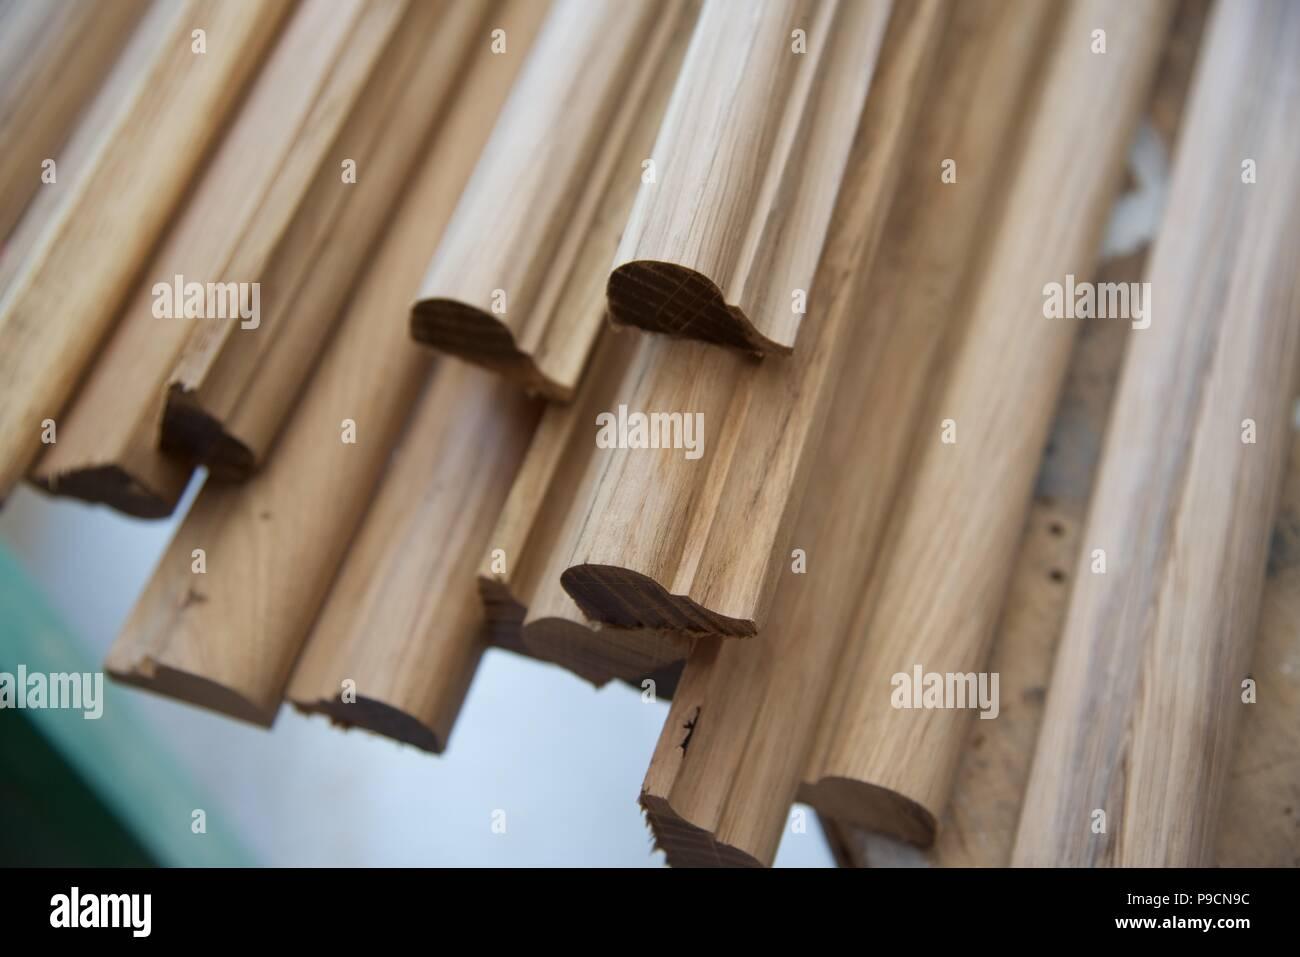 Oak mouldings: a number of lengths of decorative oak nosing - Stock Image